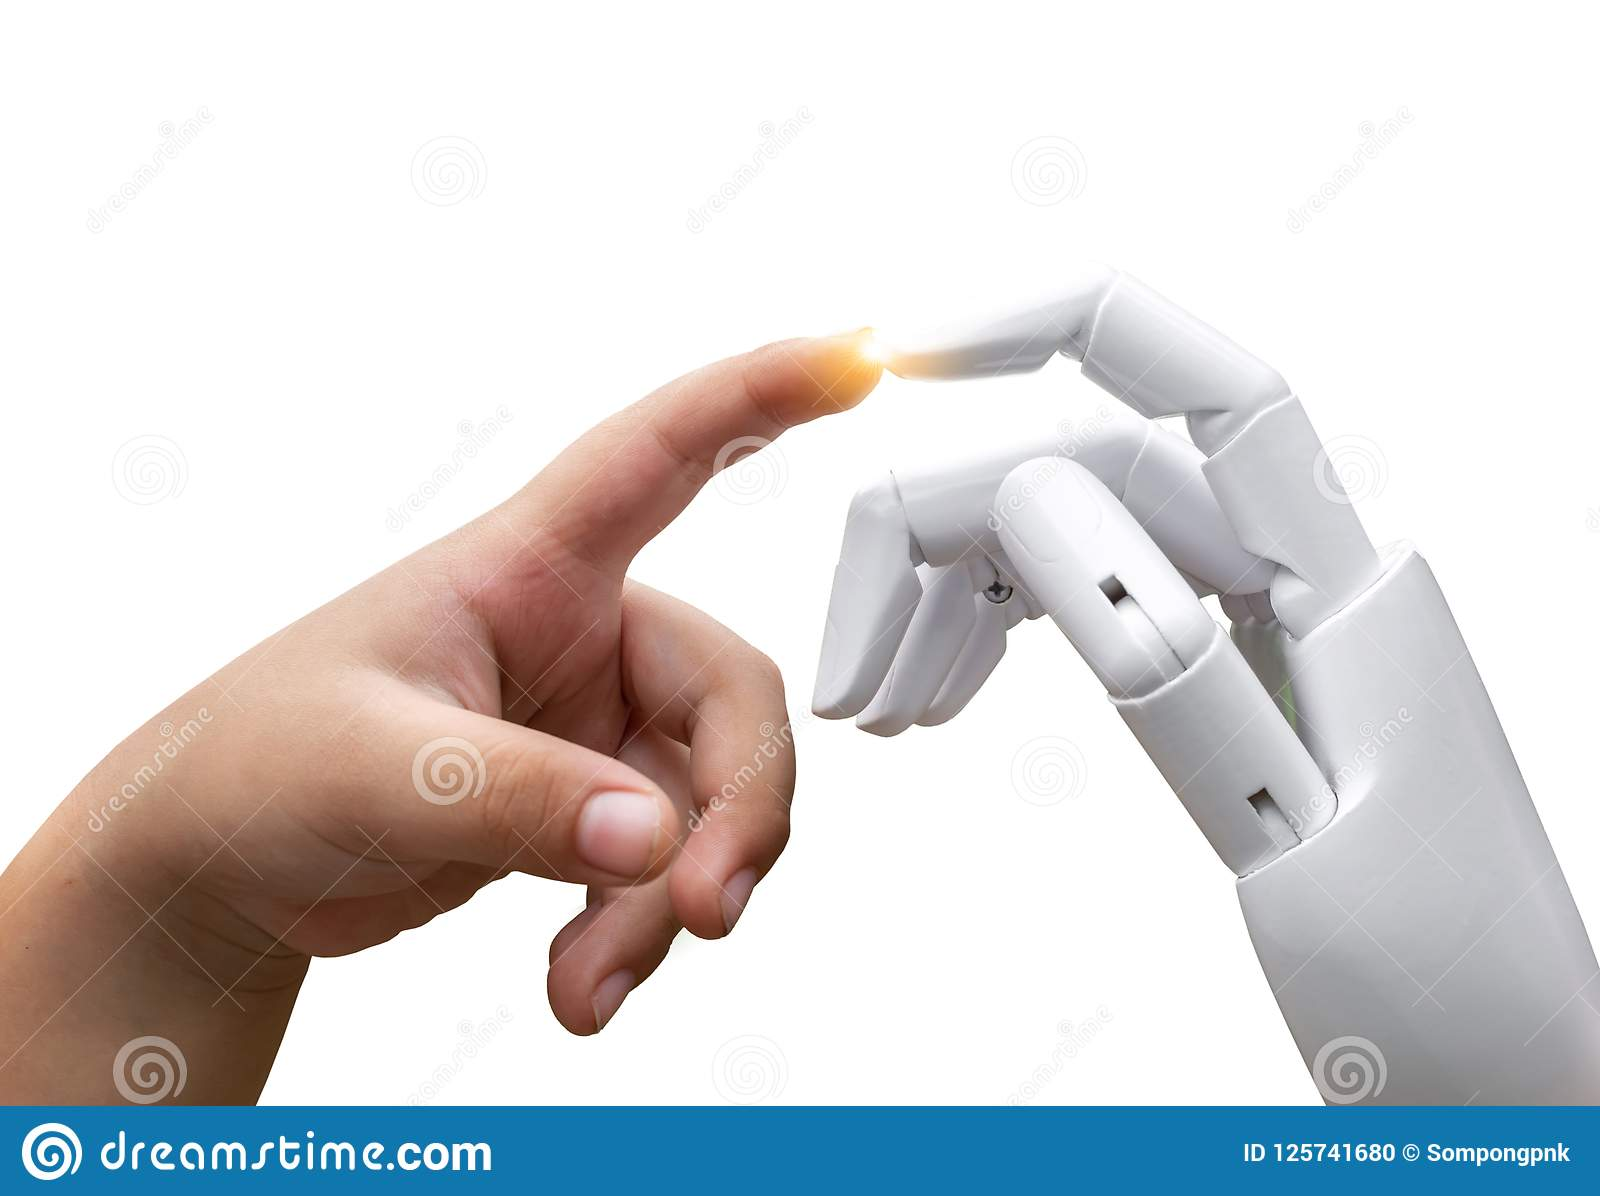 Robotic artificial intelligence future transition child human hand finger hit robot hand press